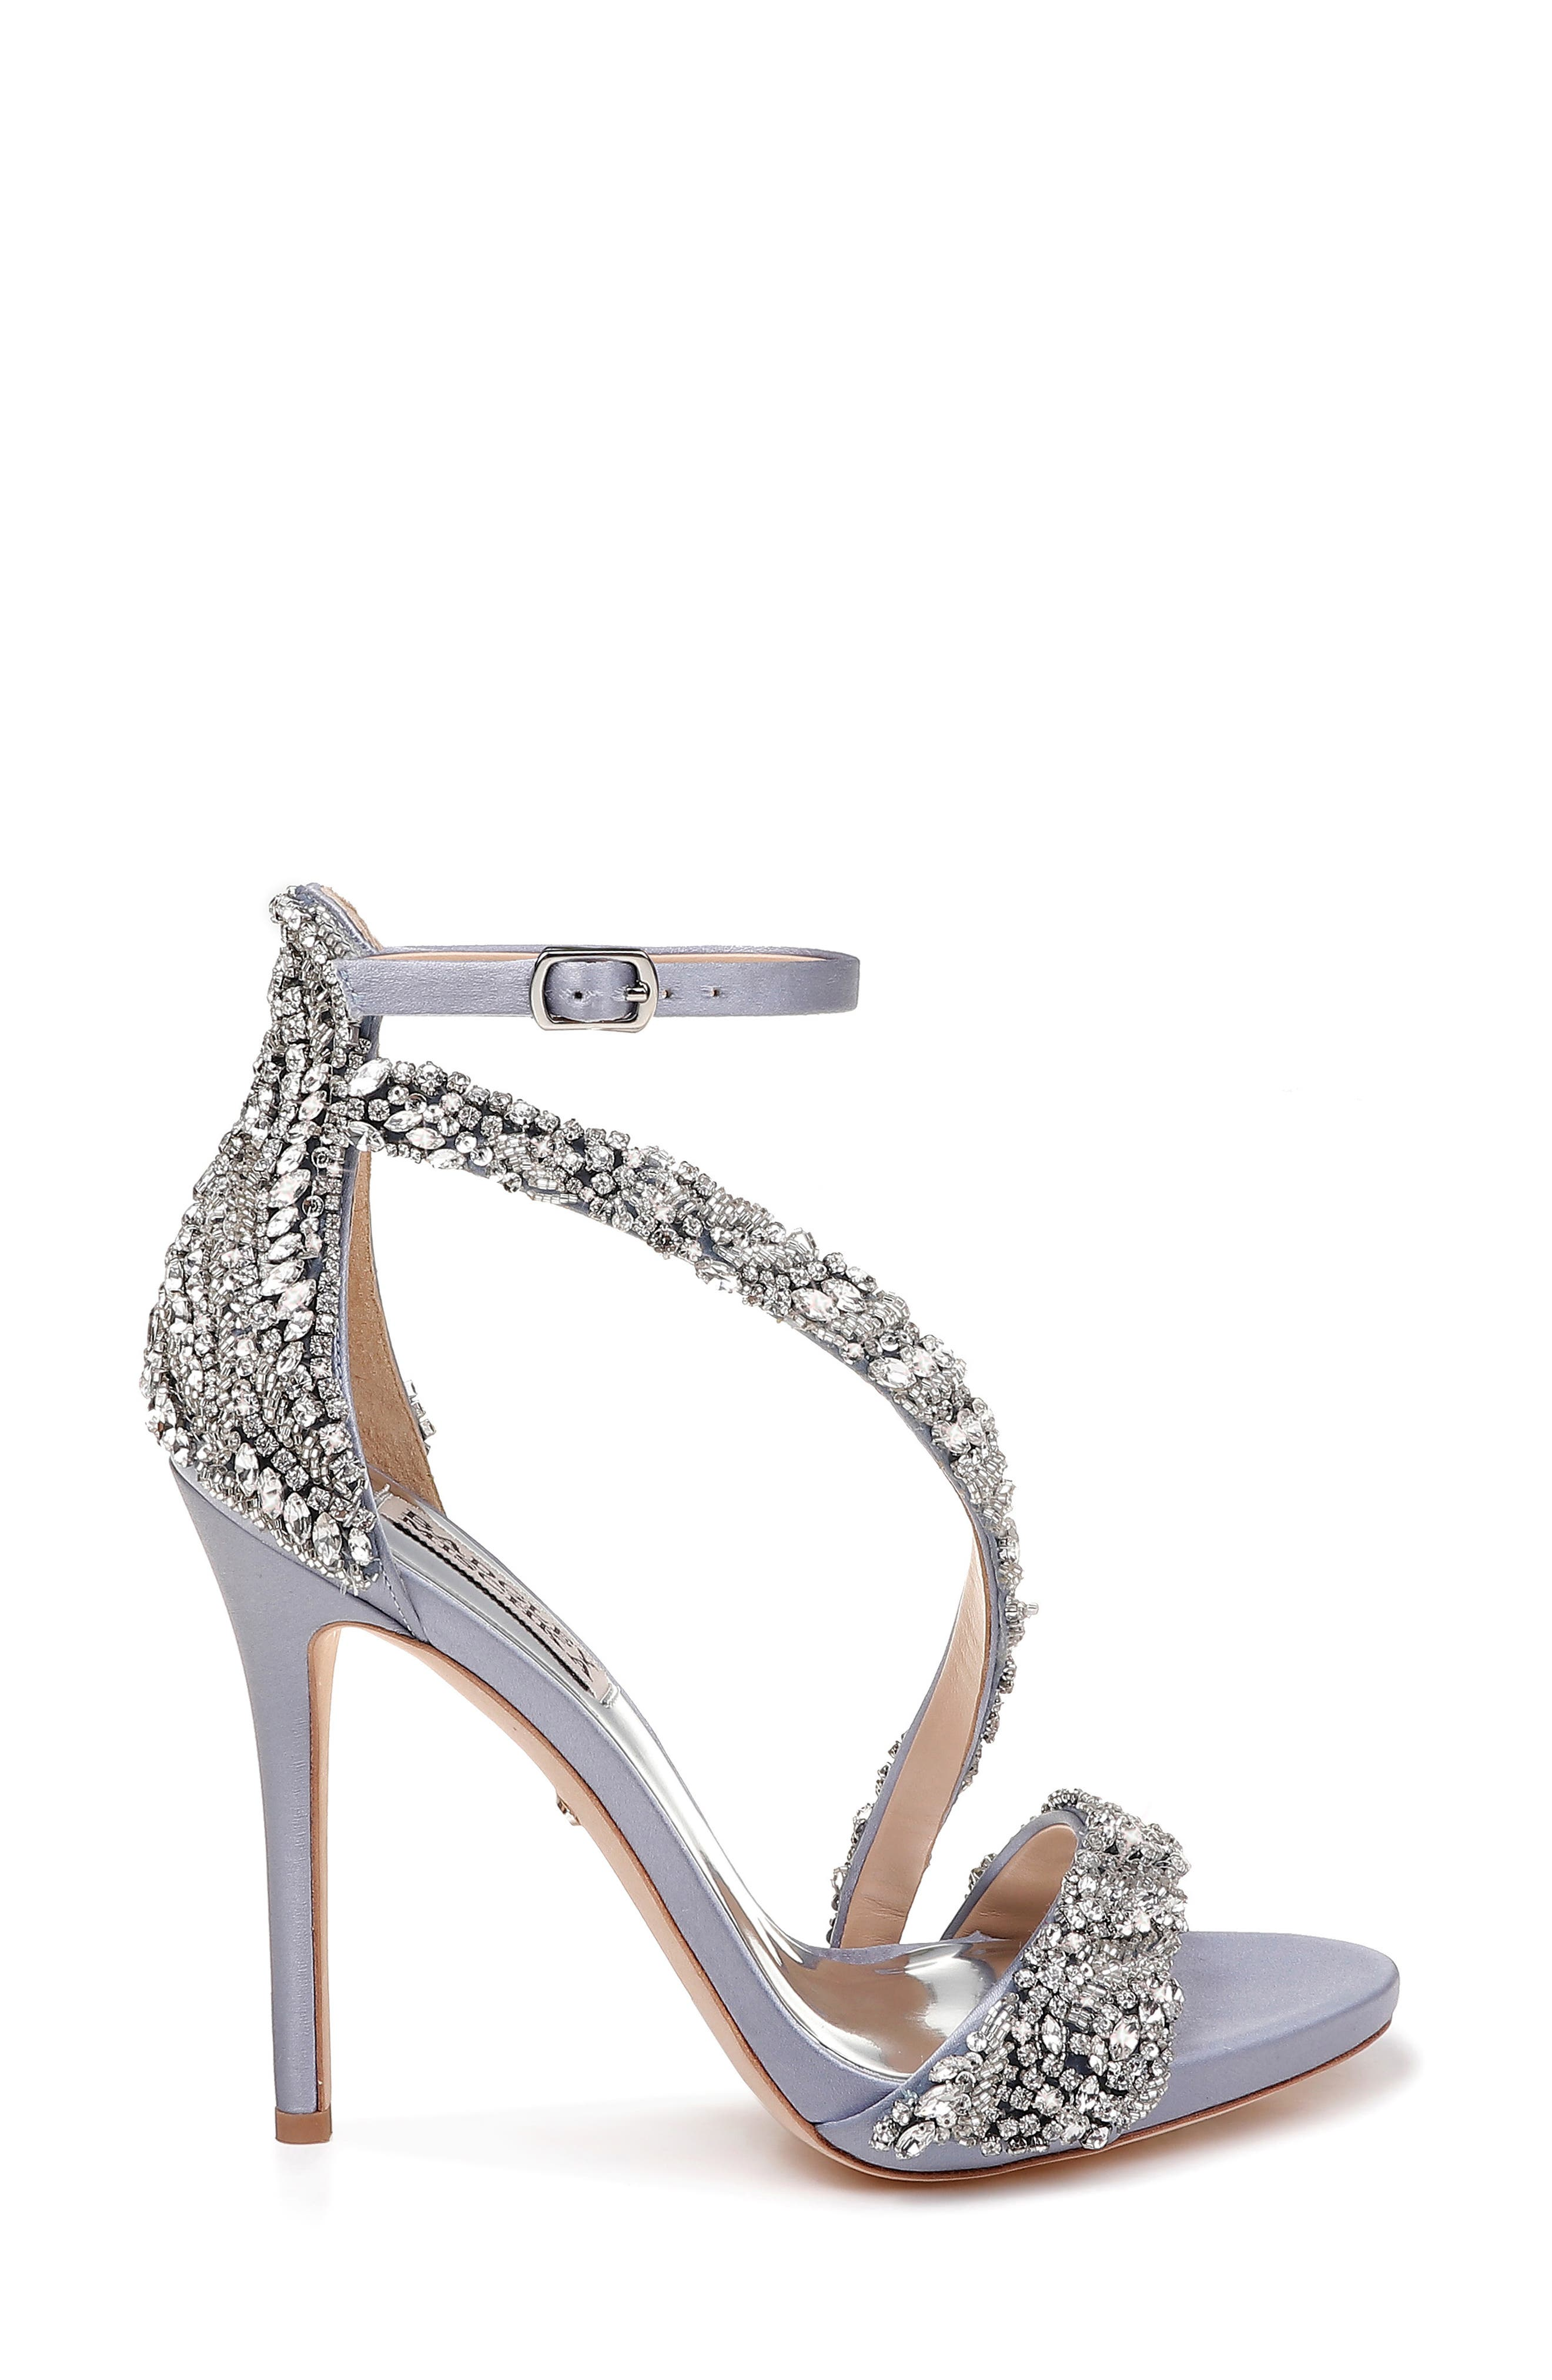 Badgley Mischka Venice Crystal Embellished Strappy Sandal,                             Alternate thumbnail 3, color,                             459